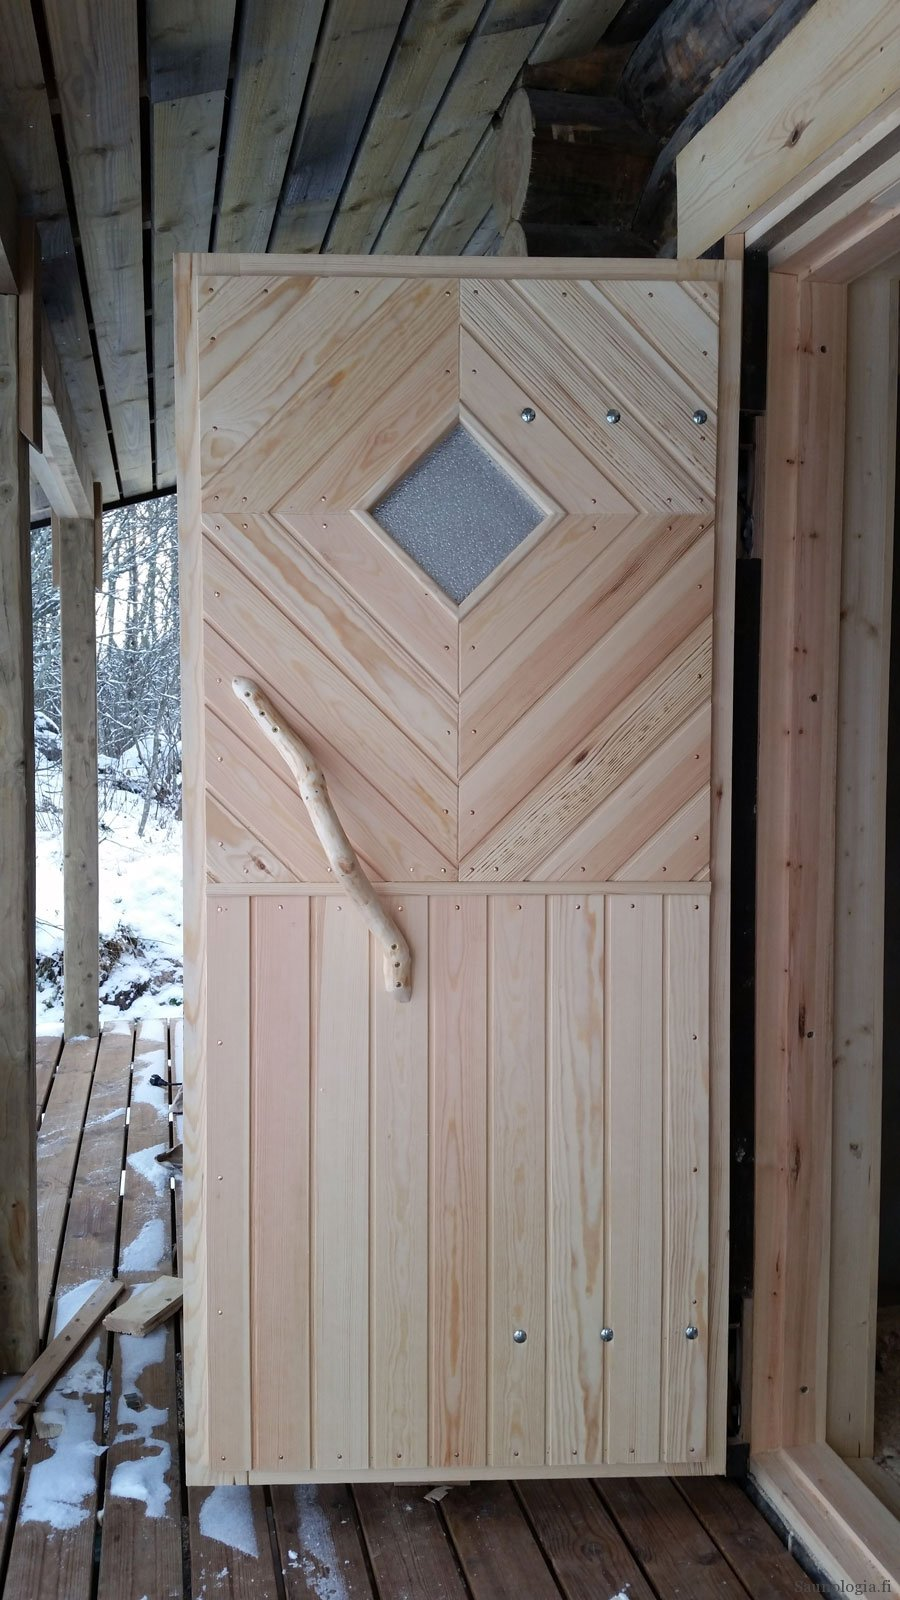 Saunan ovi – mallit ja muotoilu – Saunologia fi